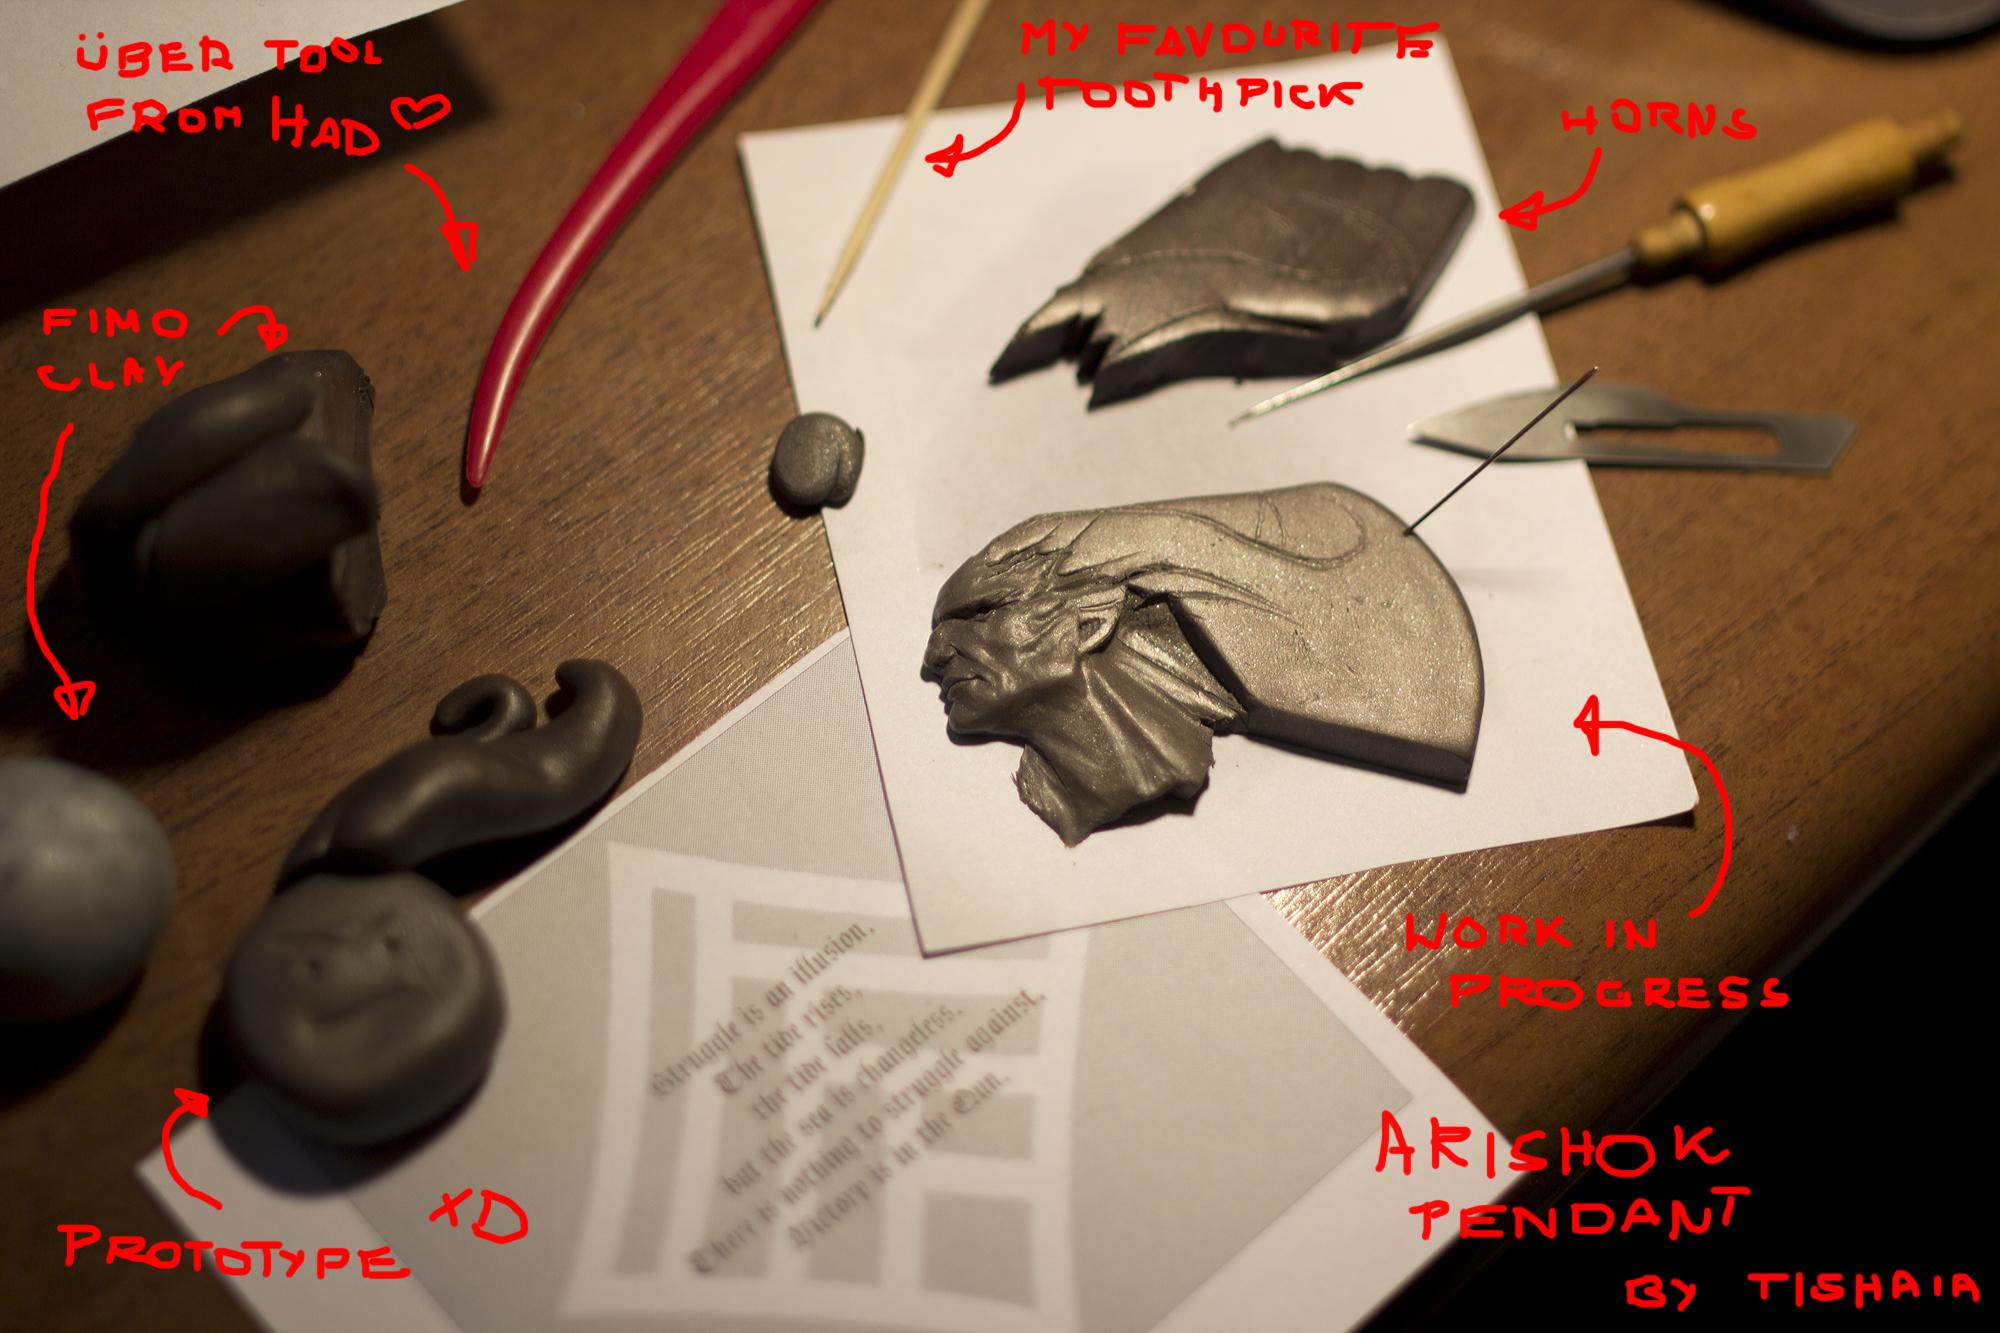 Work in progress - Arishok pendant